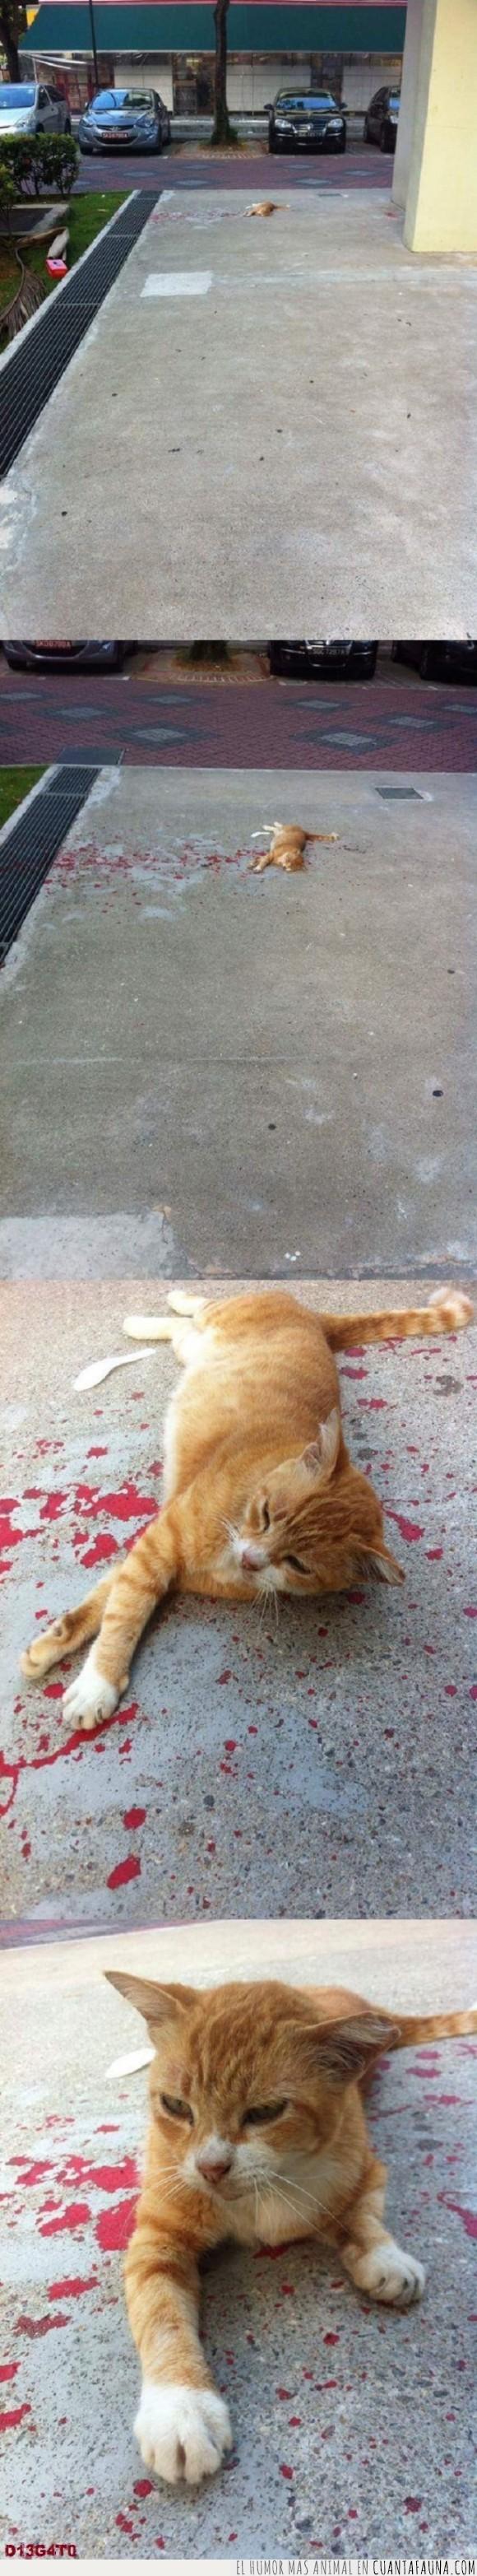 animal muerto,gato,perspectiva,pintura,sangre,solo pintura,susto